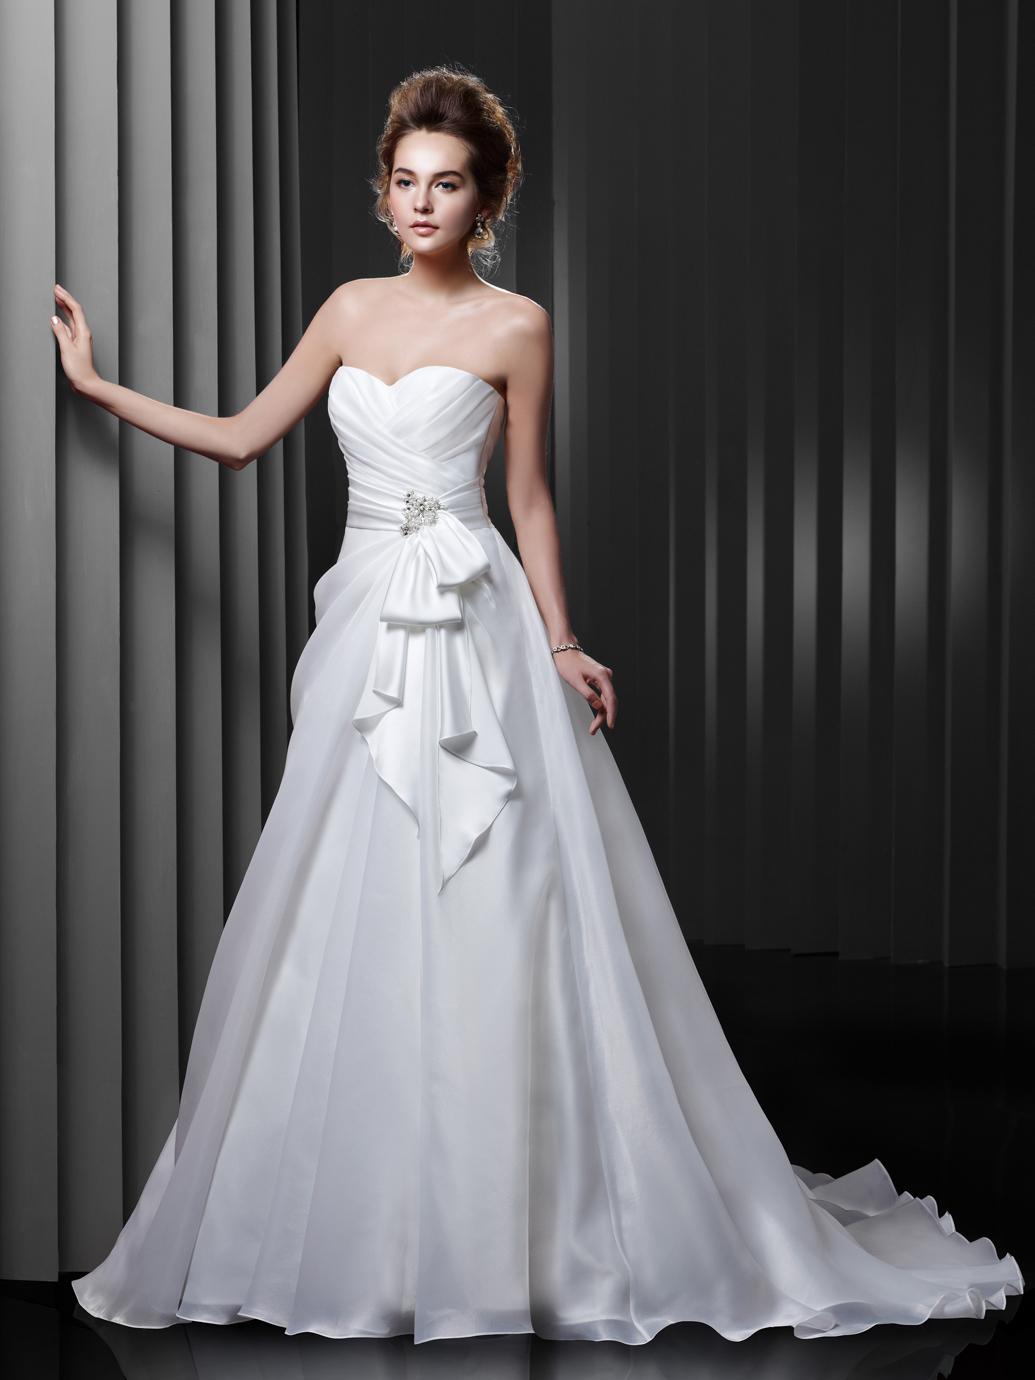 Brautkleid Enzoani A-Linie mit Schleife